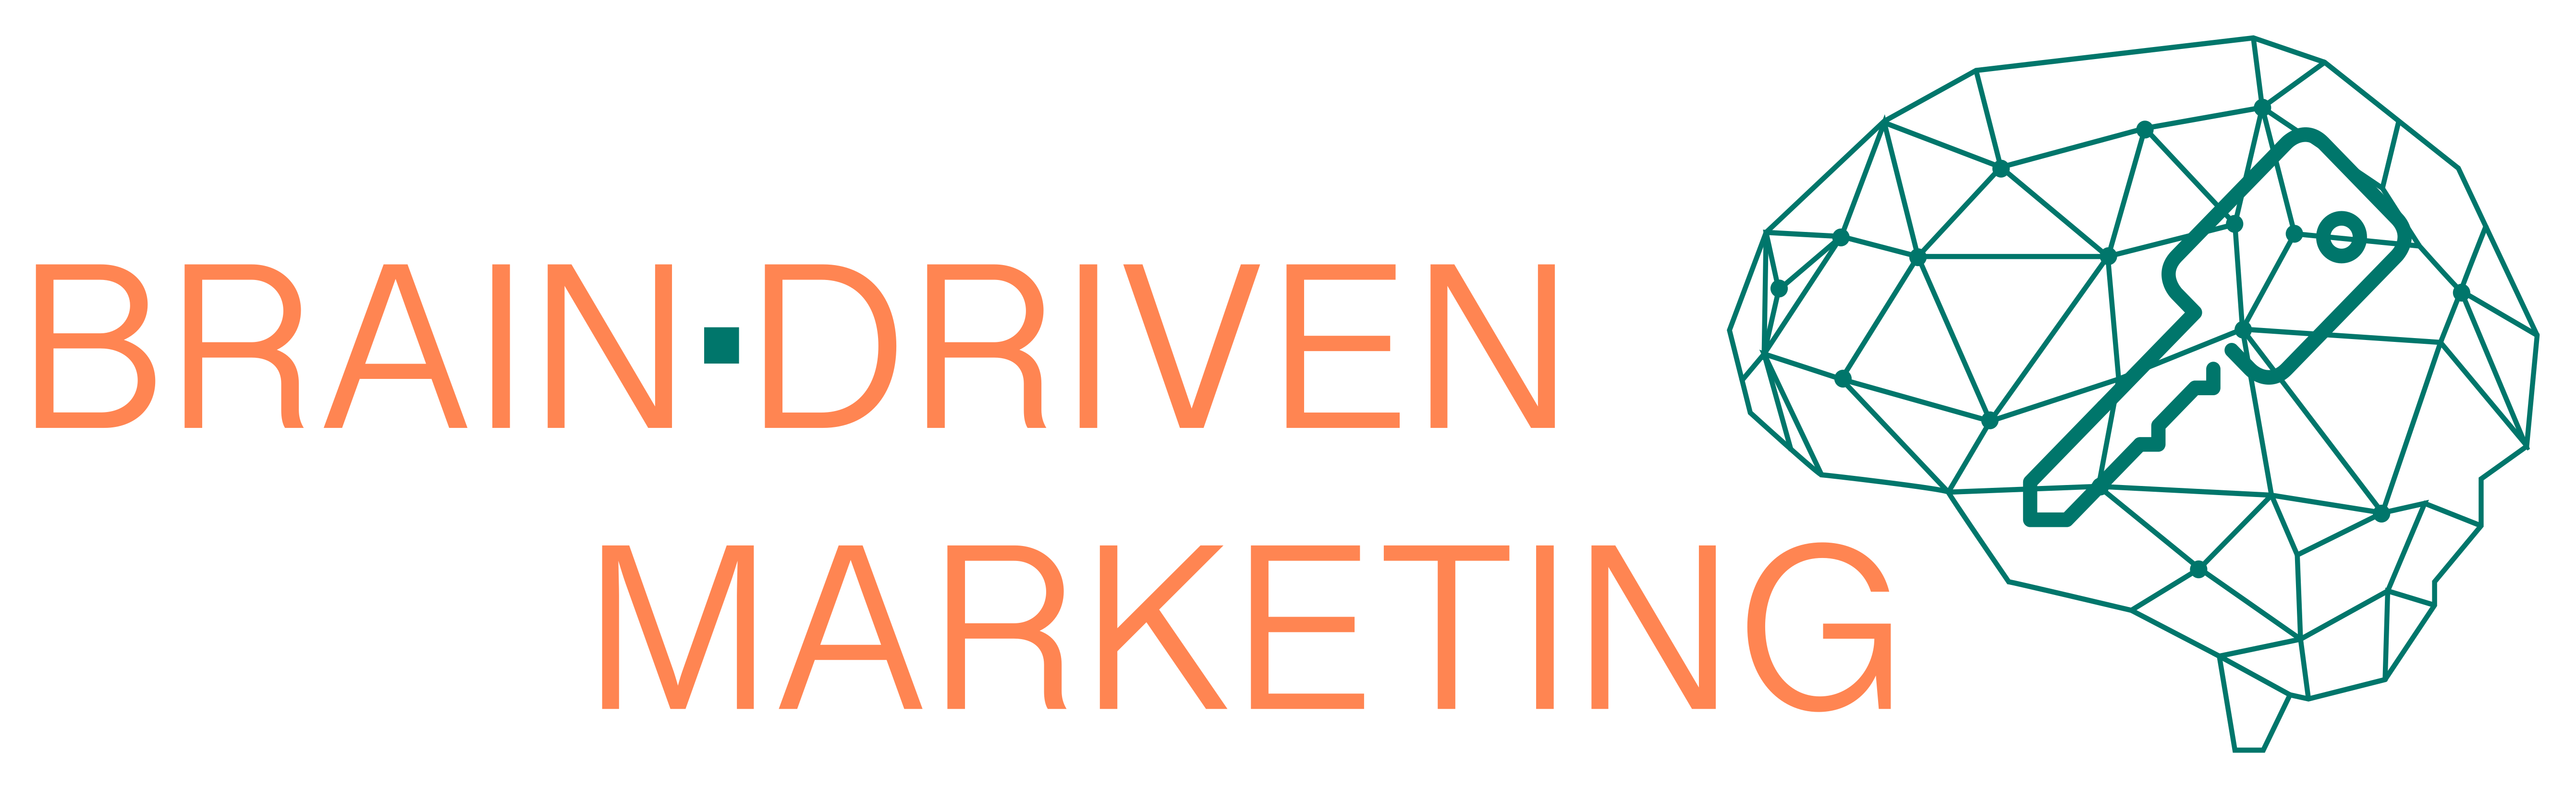 Braindriven Marketing